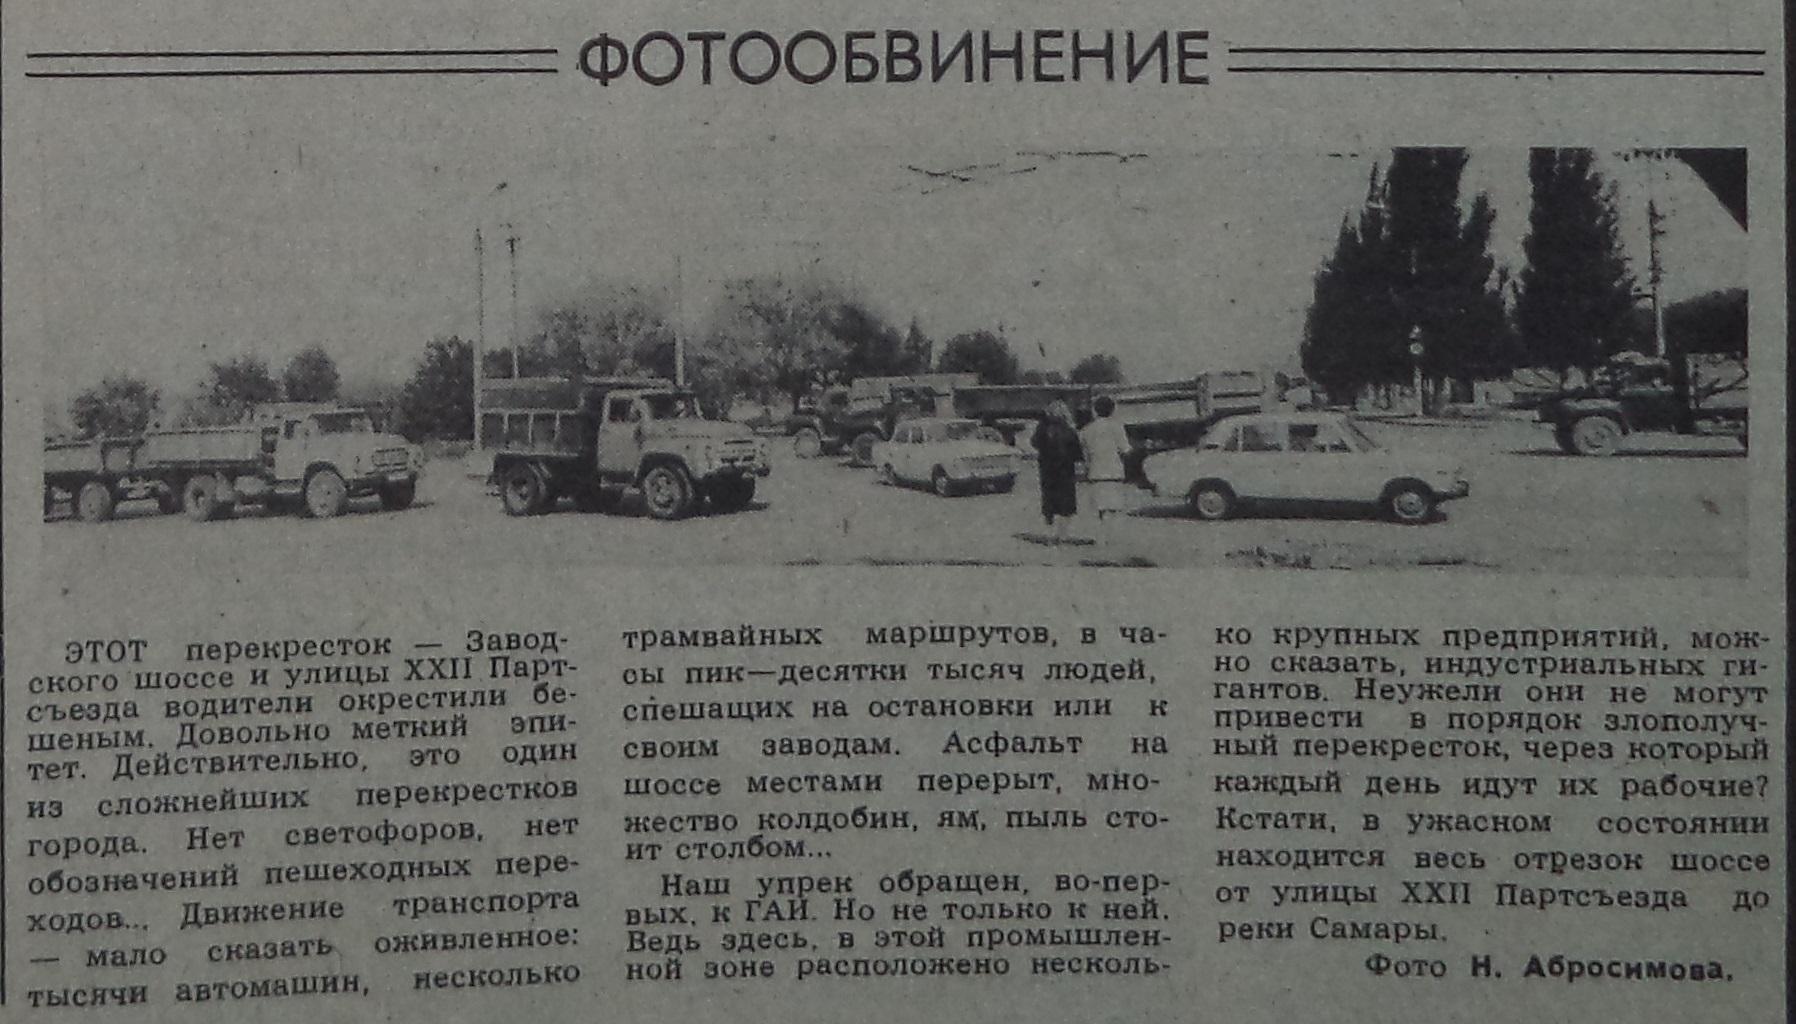 Заводское-ФОТО-40-ВЗя-1989-06-03-фото с перекр. XXII Парт. и Зав.ш.-статья